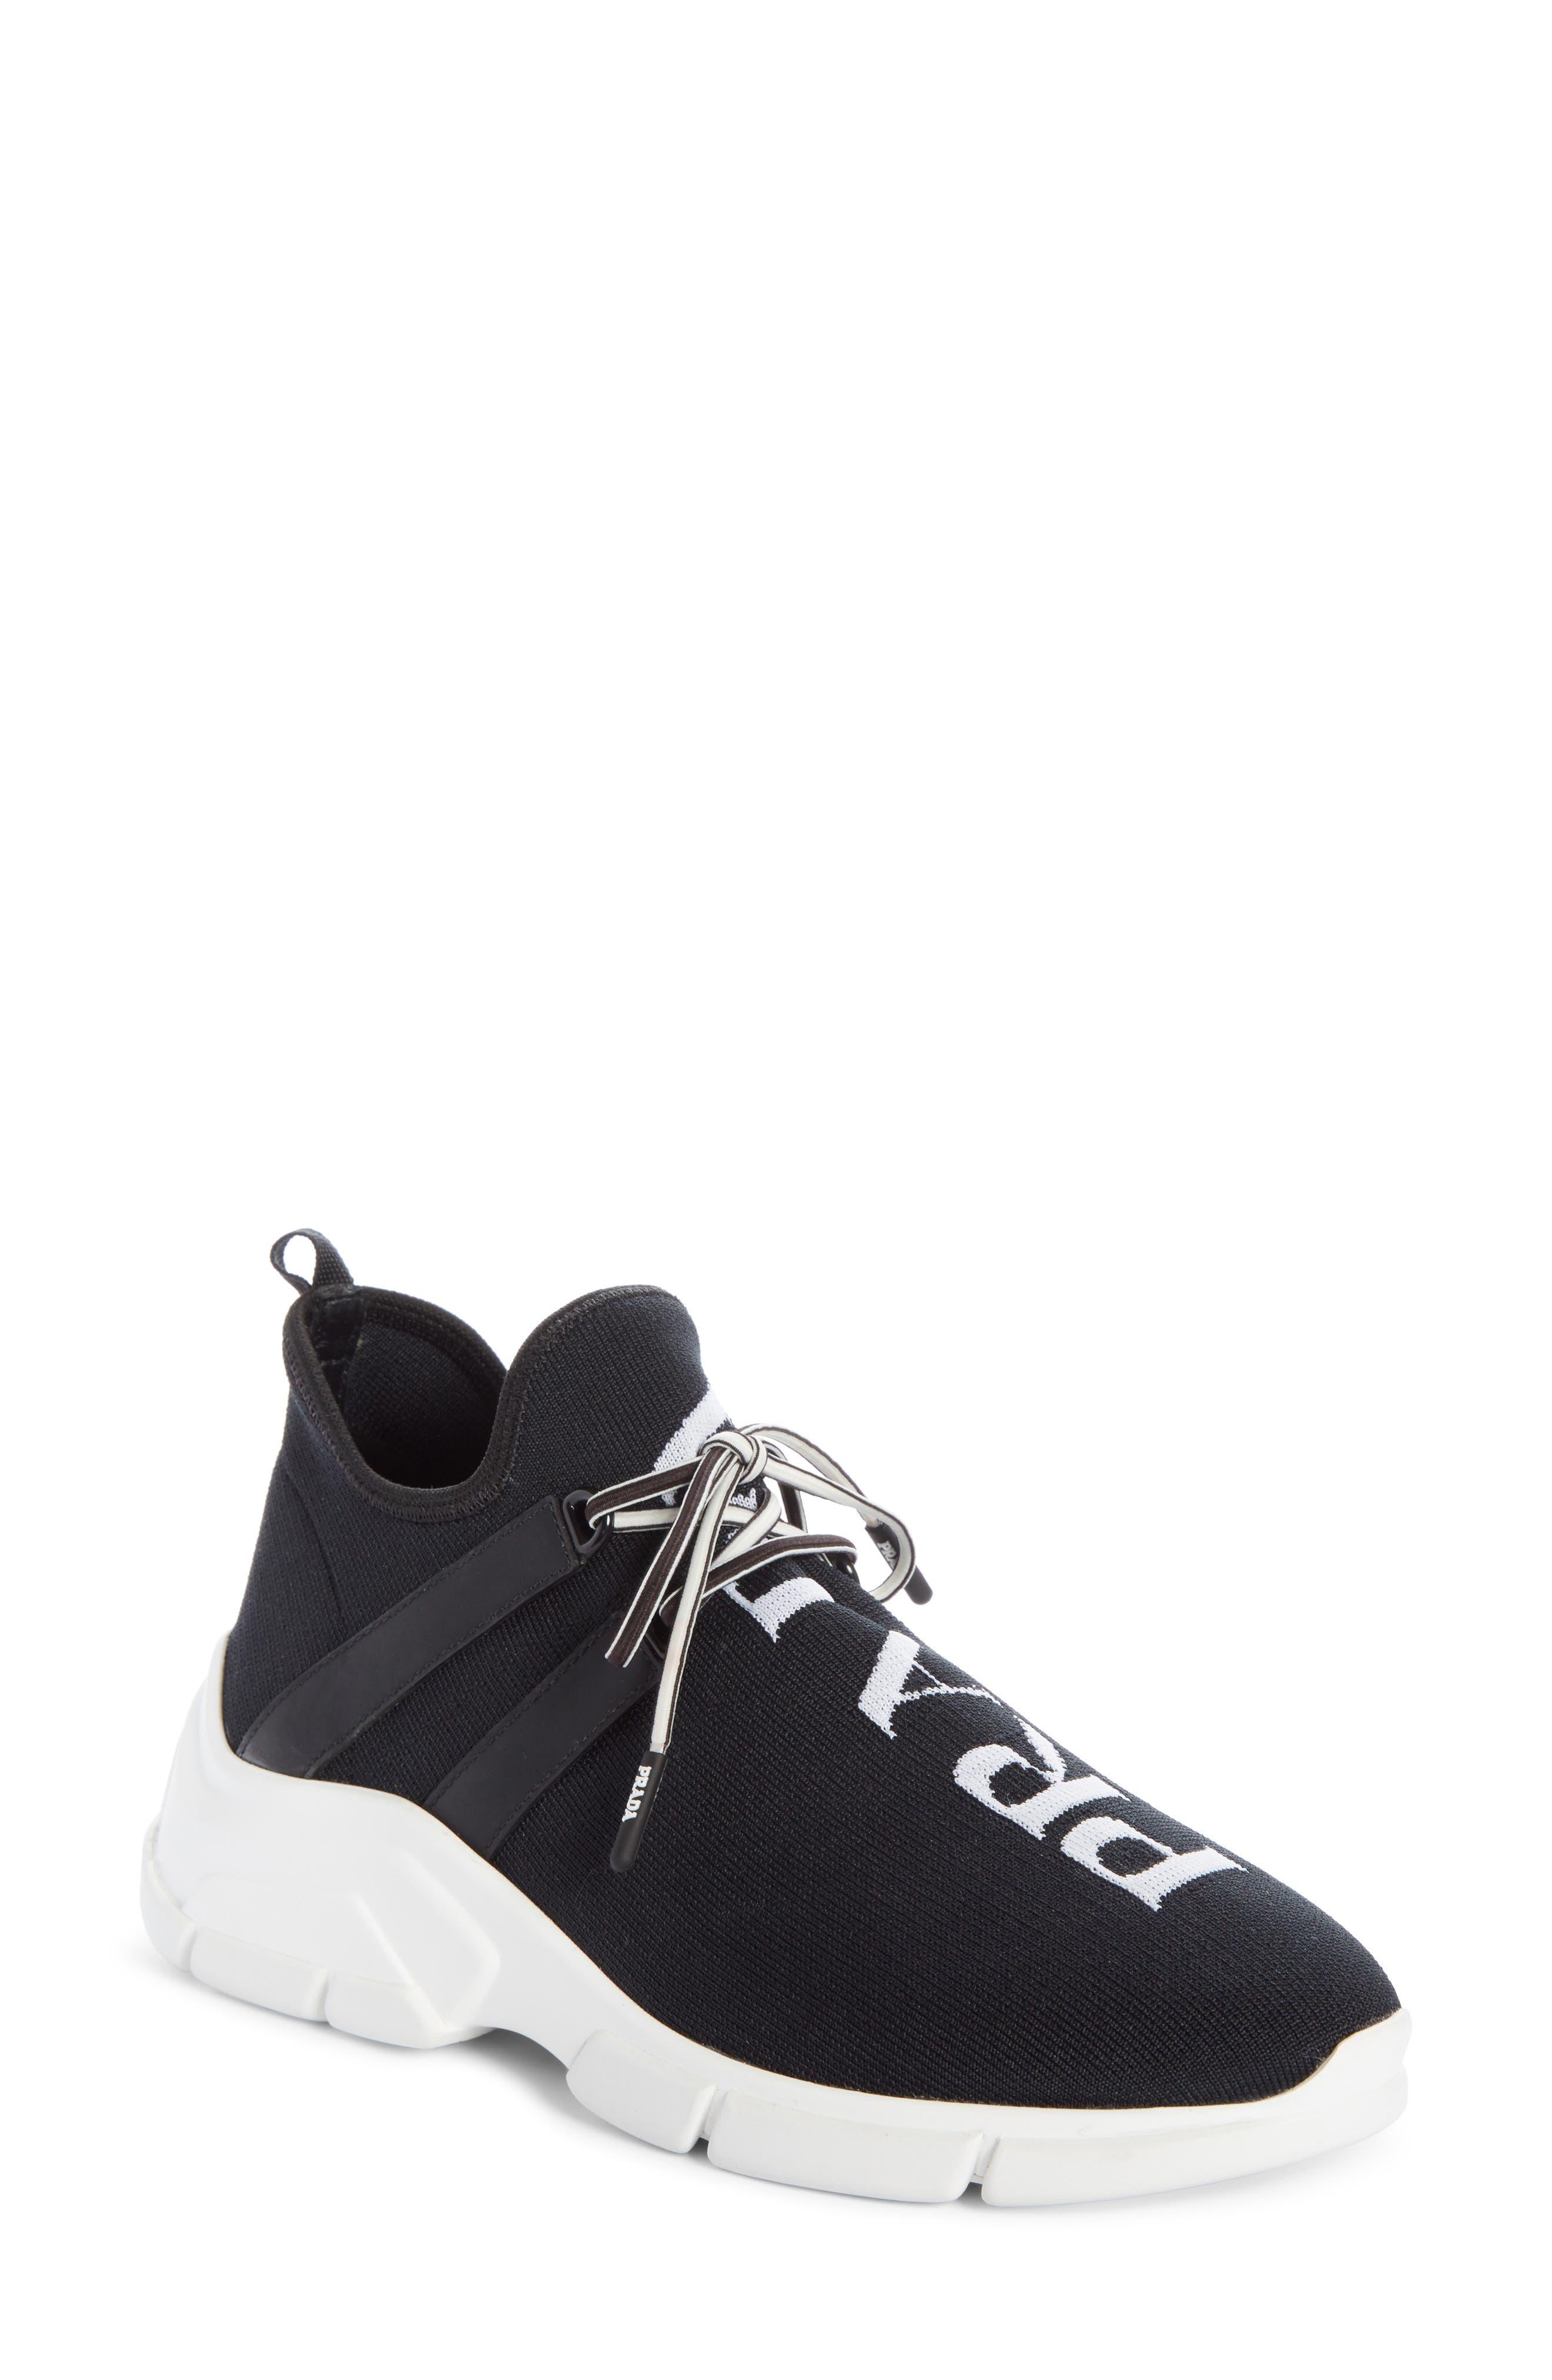 Women's Prada Sneakers \u0026 Athletic Shoes